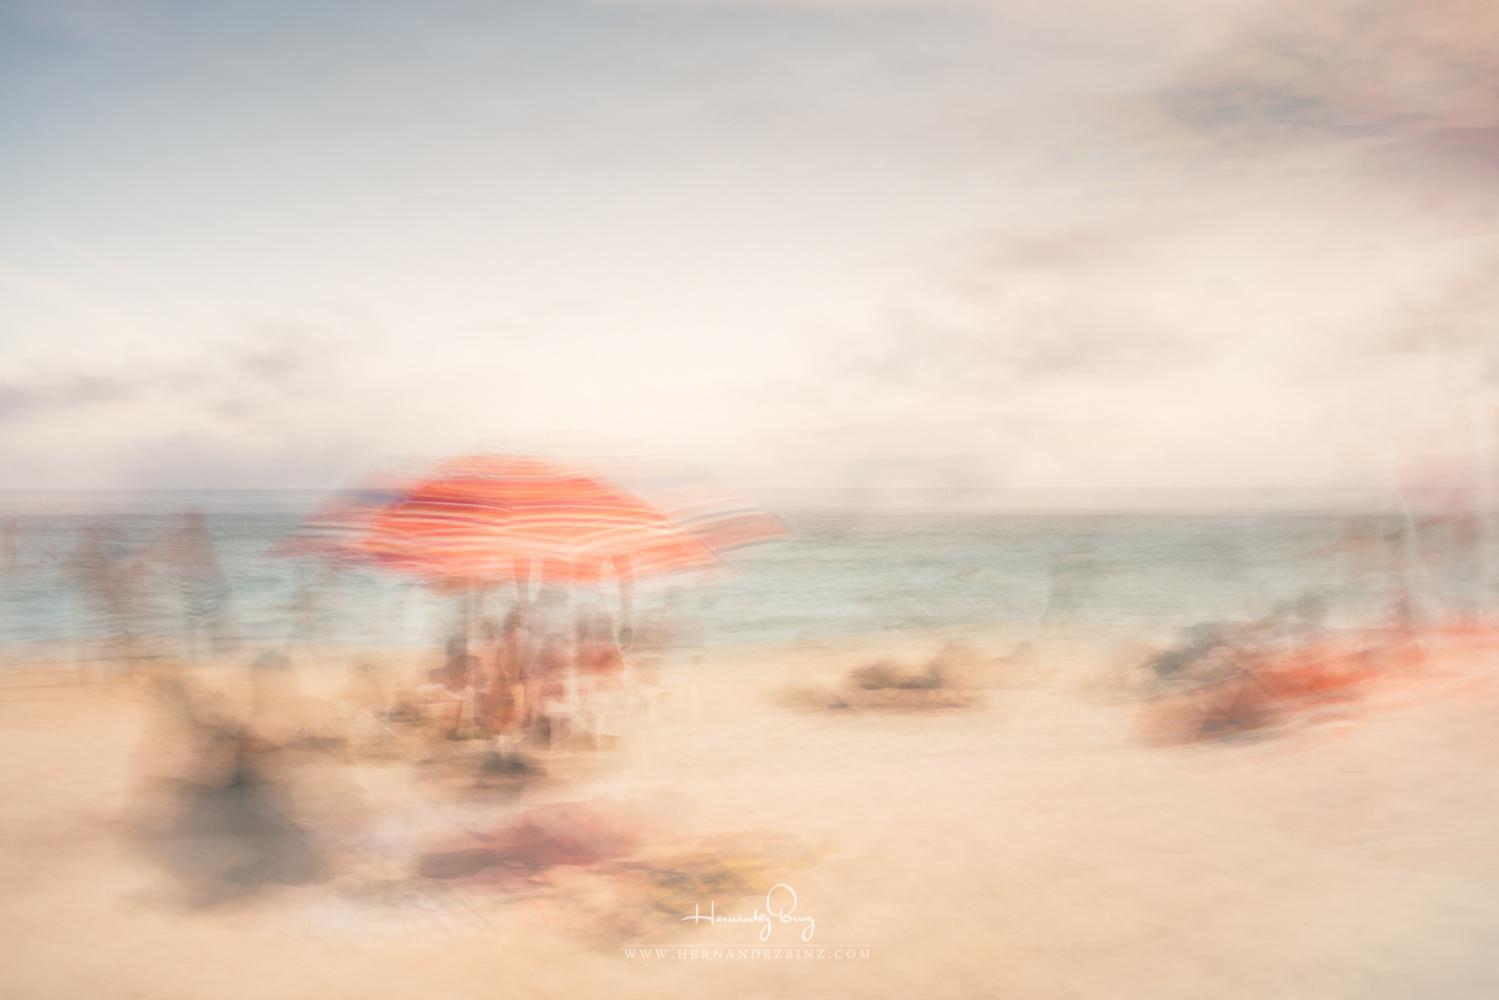 Red Umbrella by Adrian Hernandez Binz